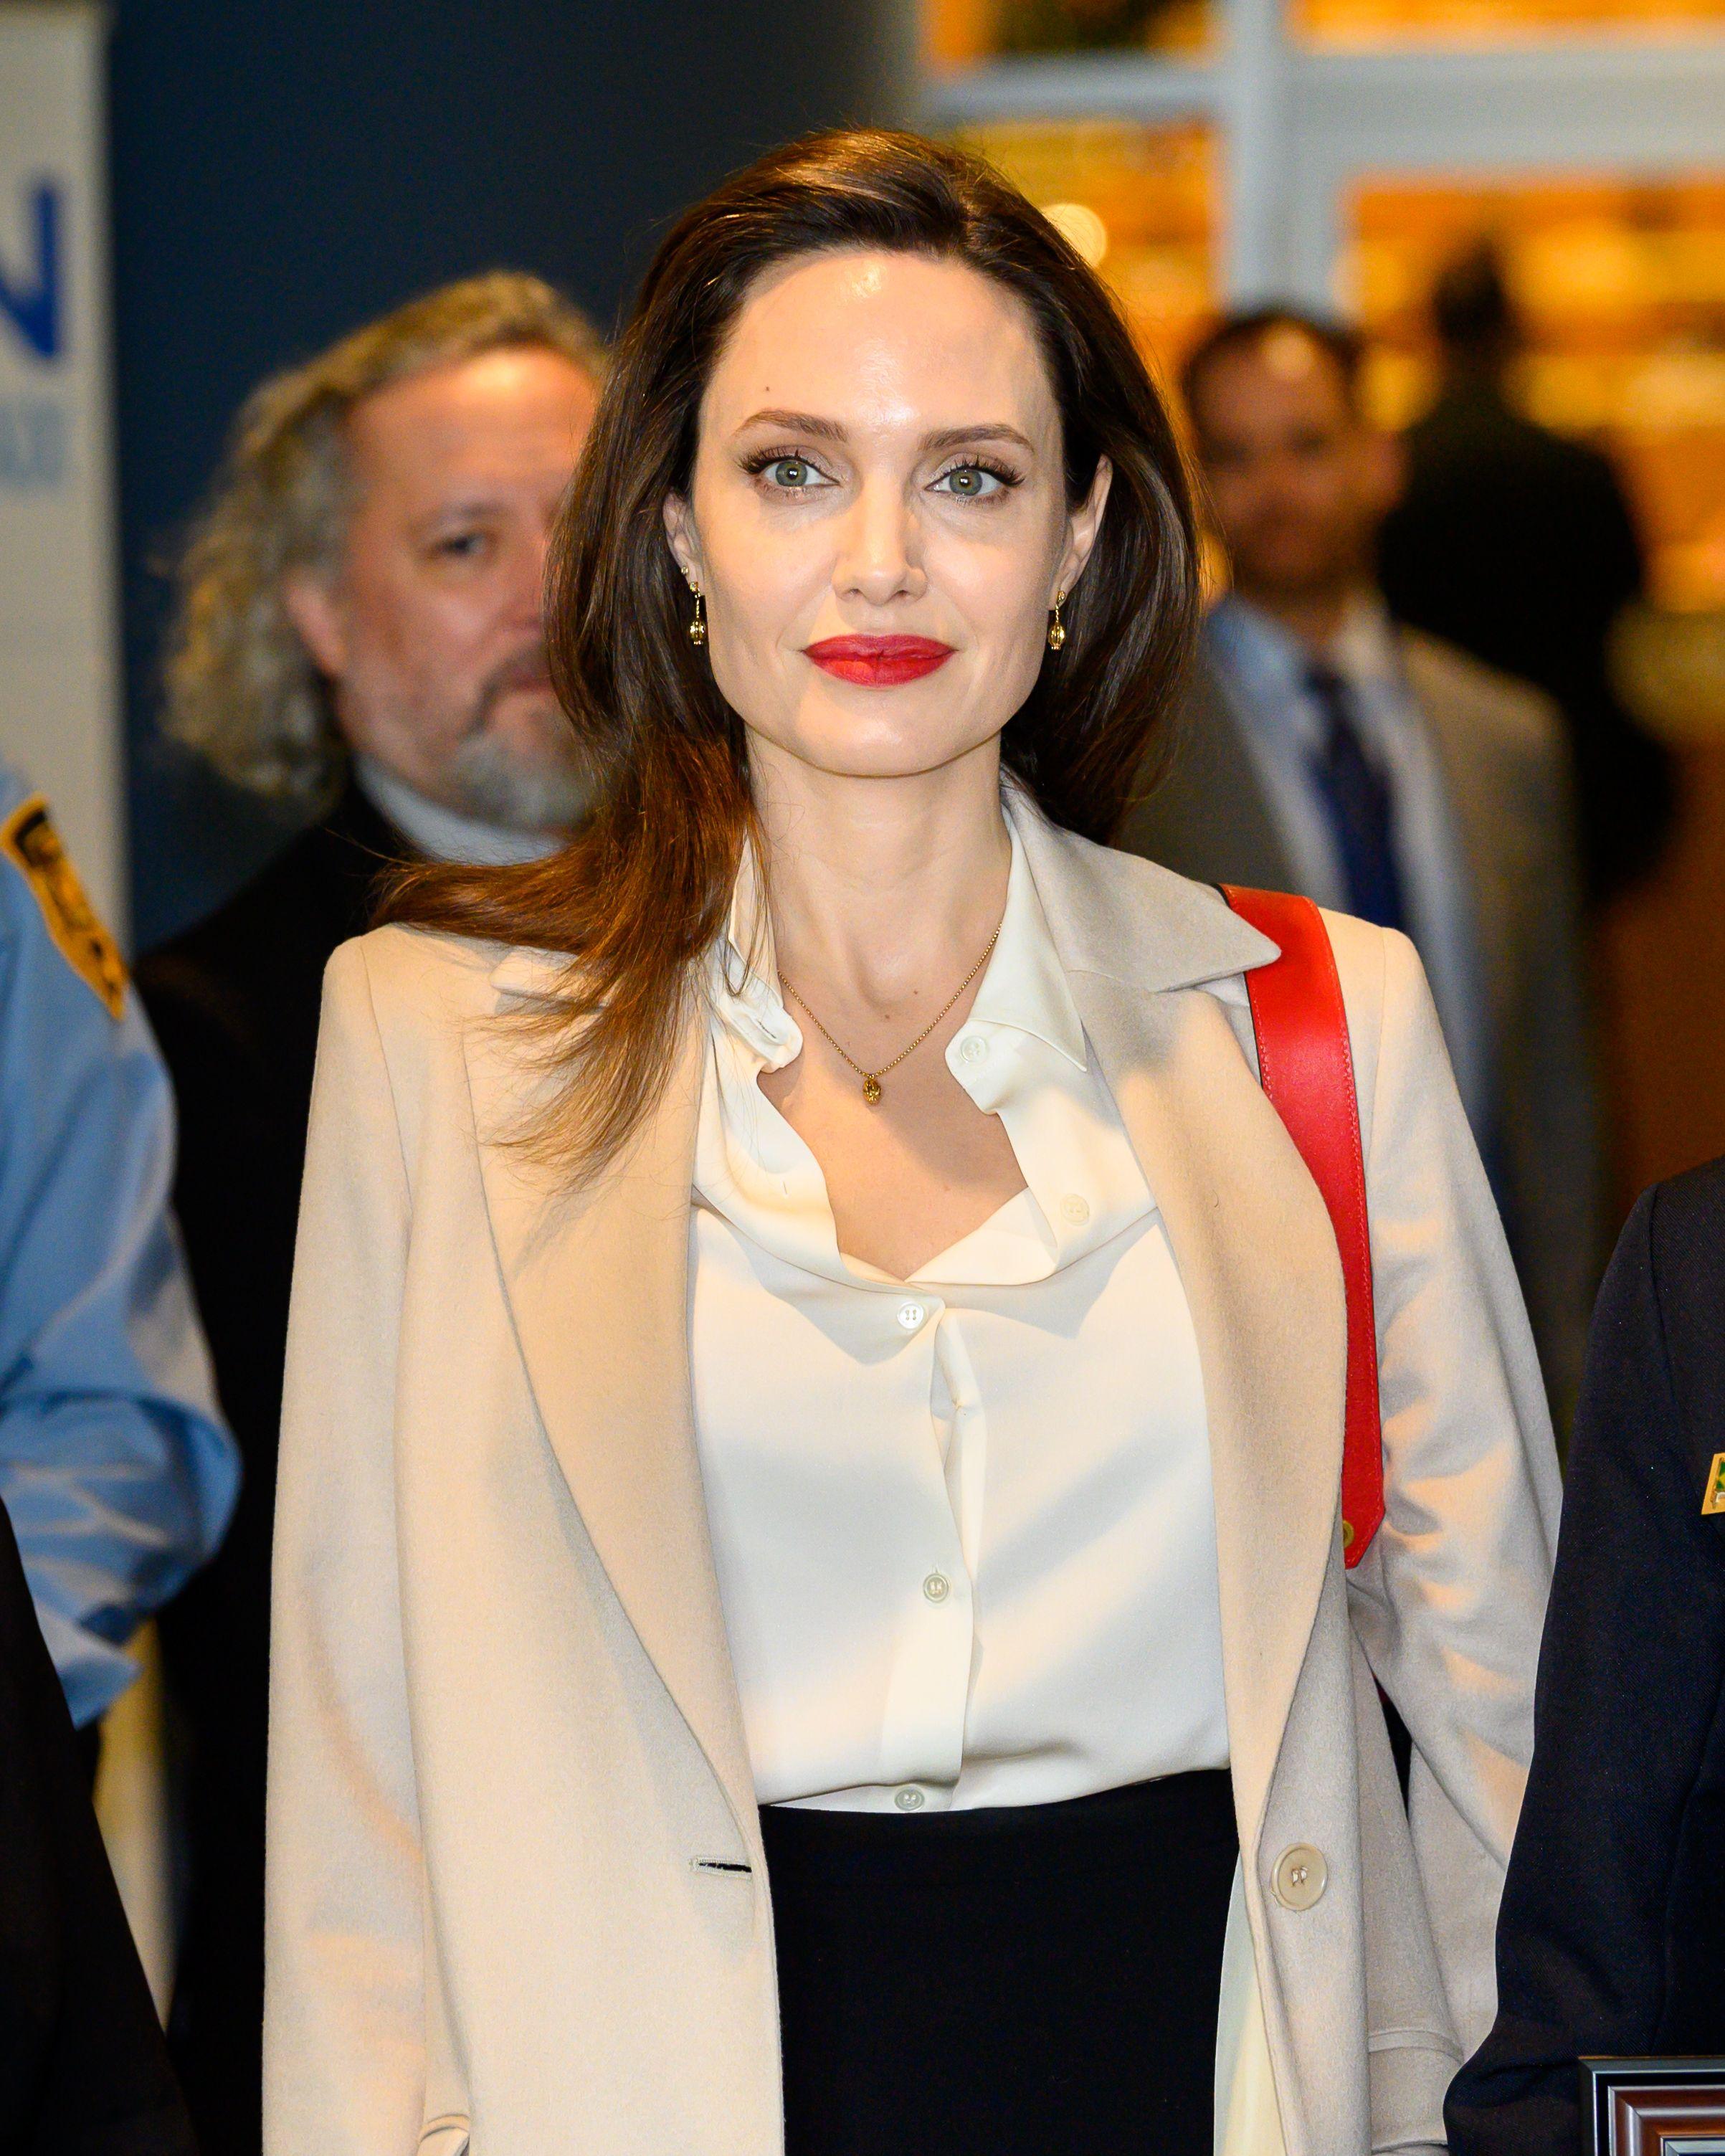 Angelina Jolie Celebrates Son Maddox Jolie-Pitt's 18th Birthday In Cleveland